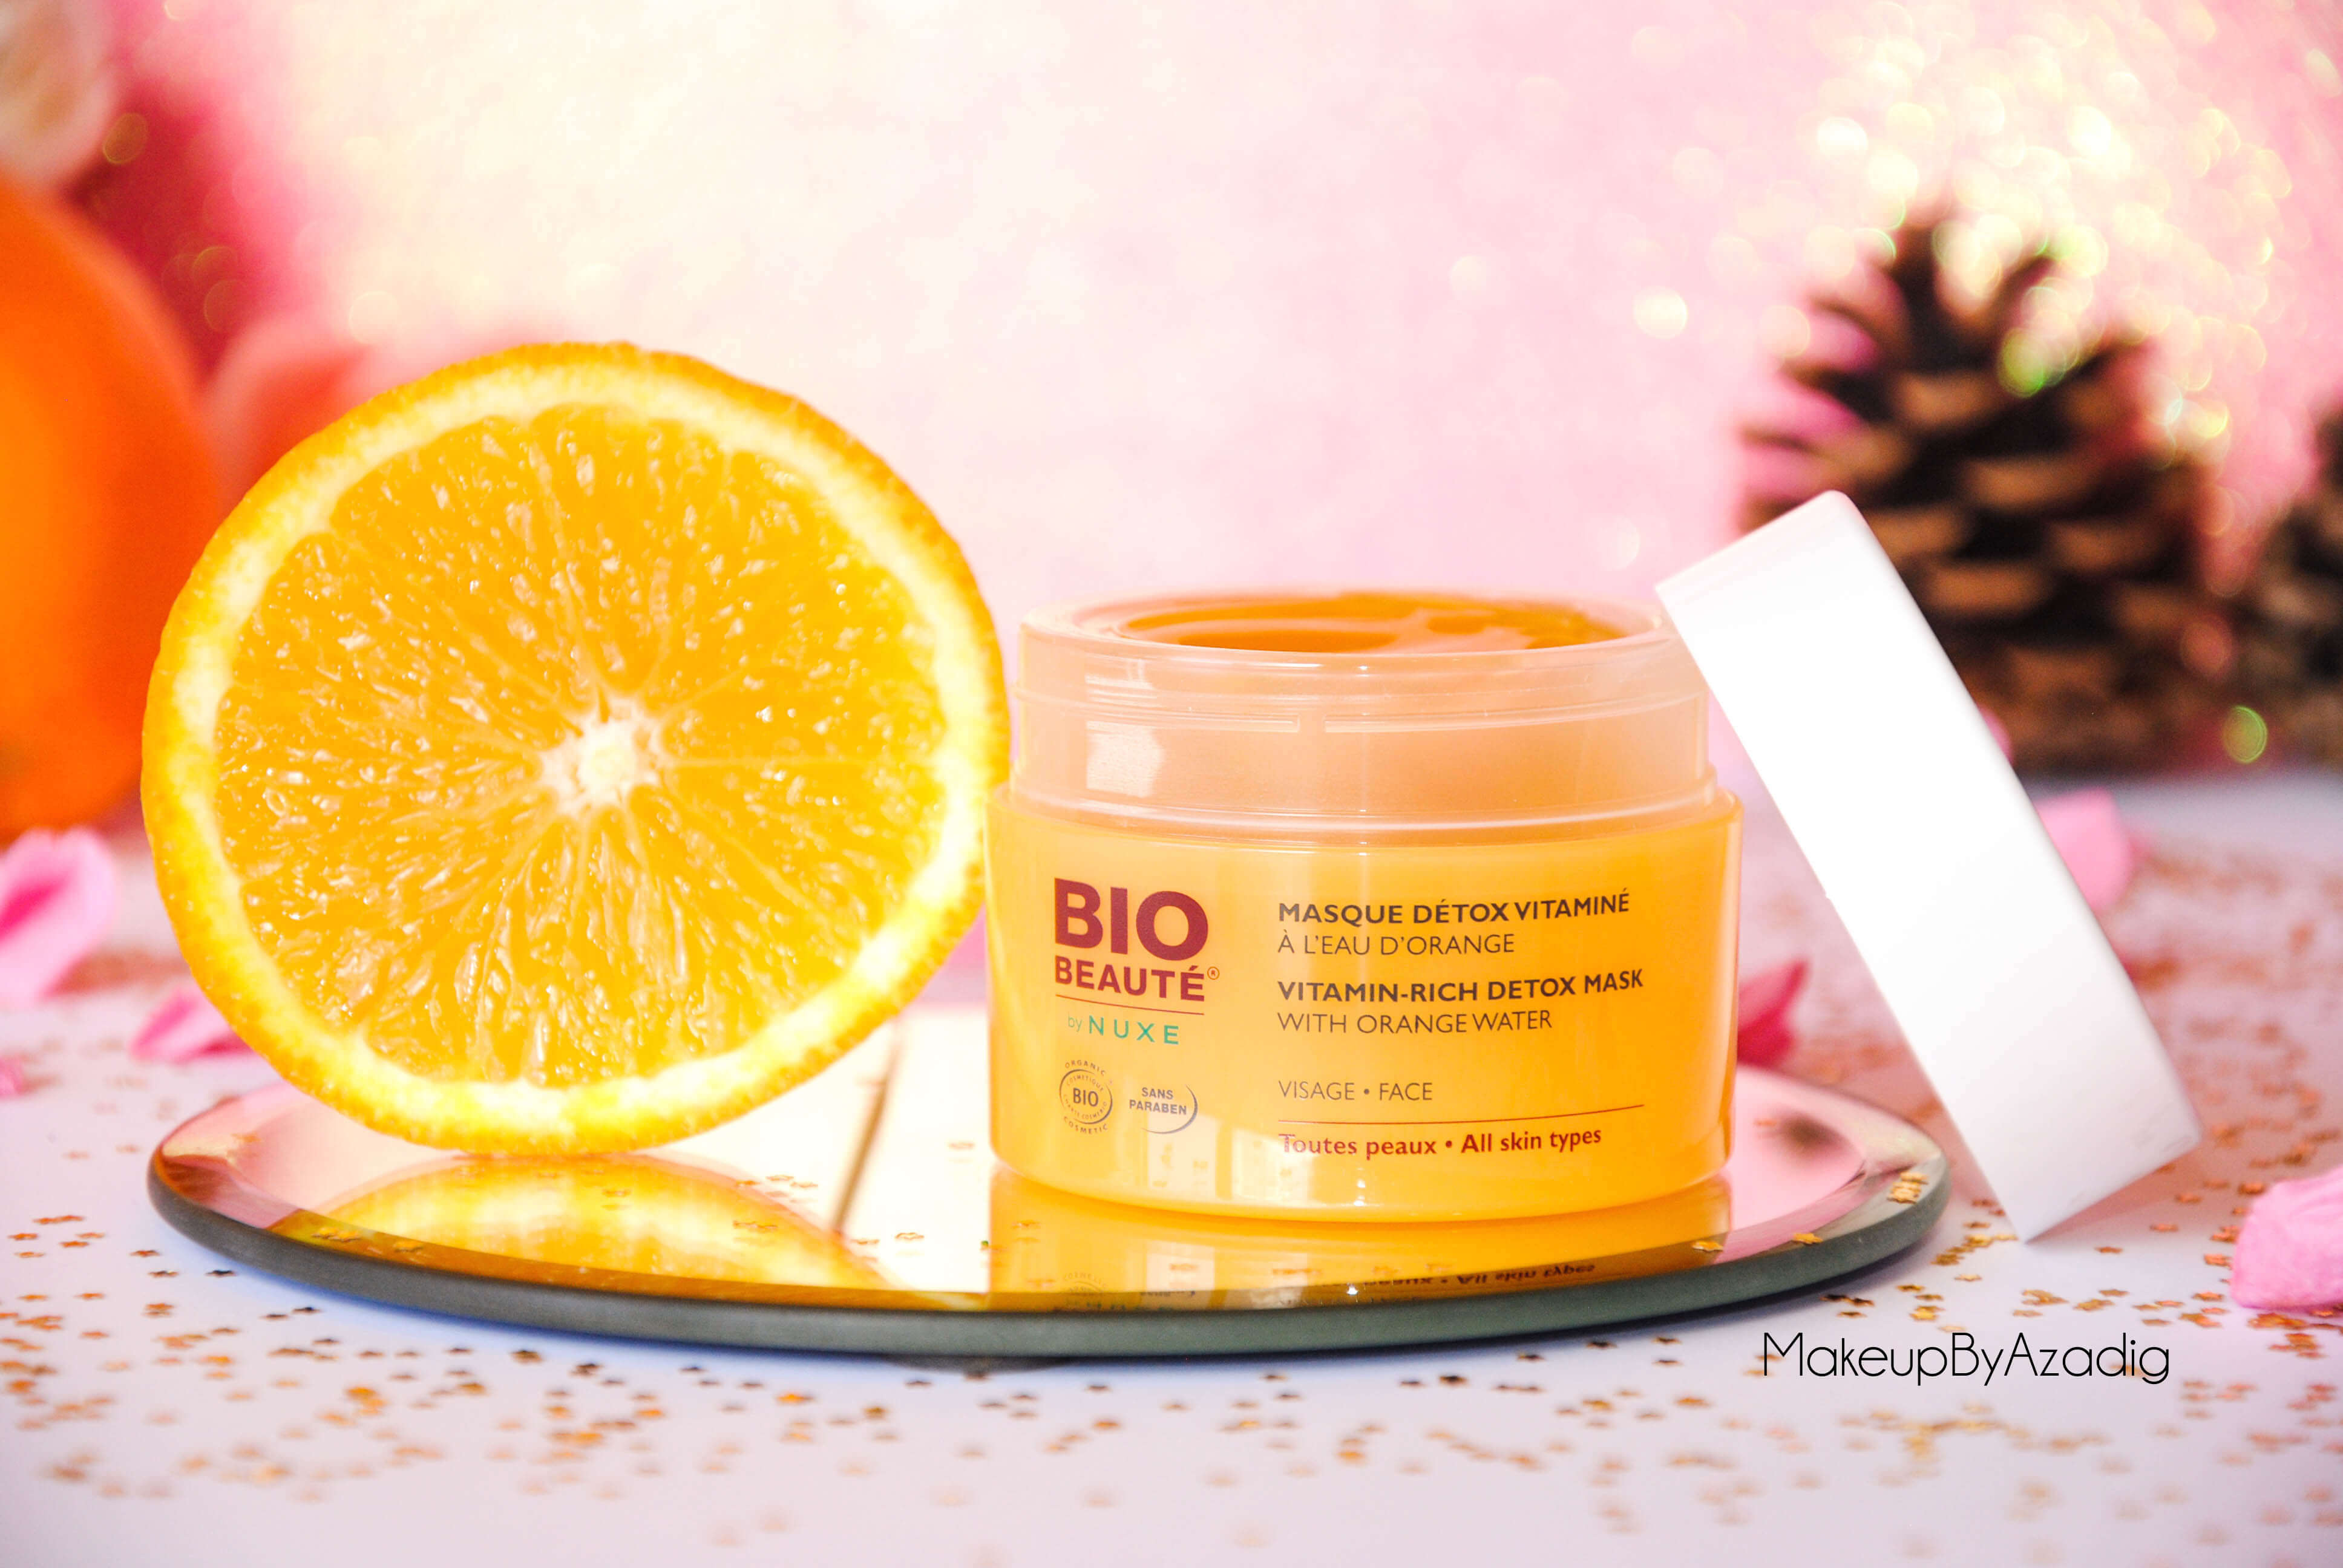 masque-detox-vitamine-bio-beaute-nuxe-makeupbyazadig-pas-cher-avis-revue-doctipharma-troyes-miniature